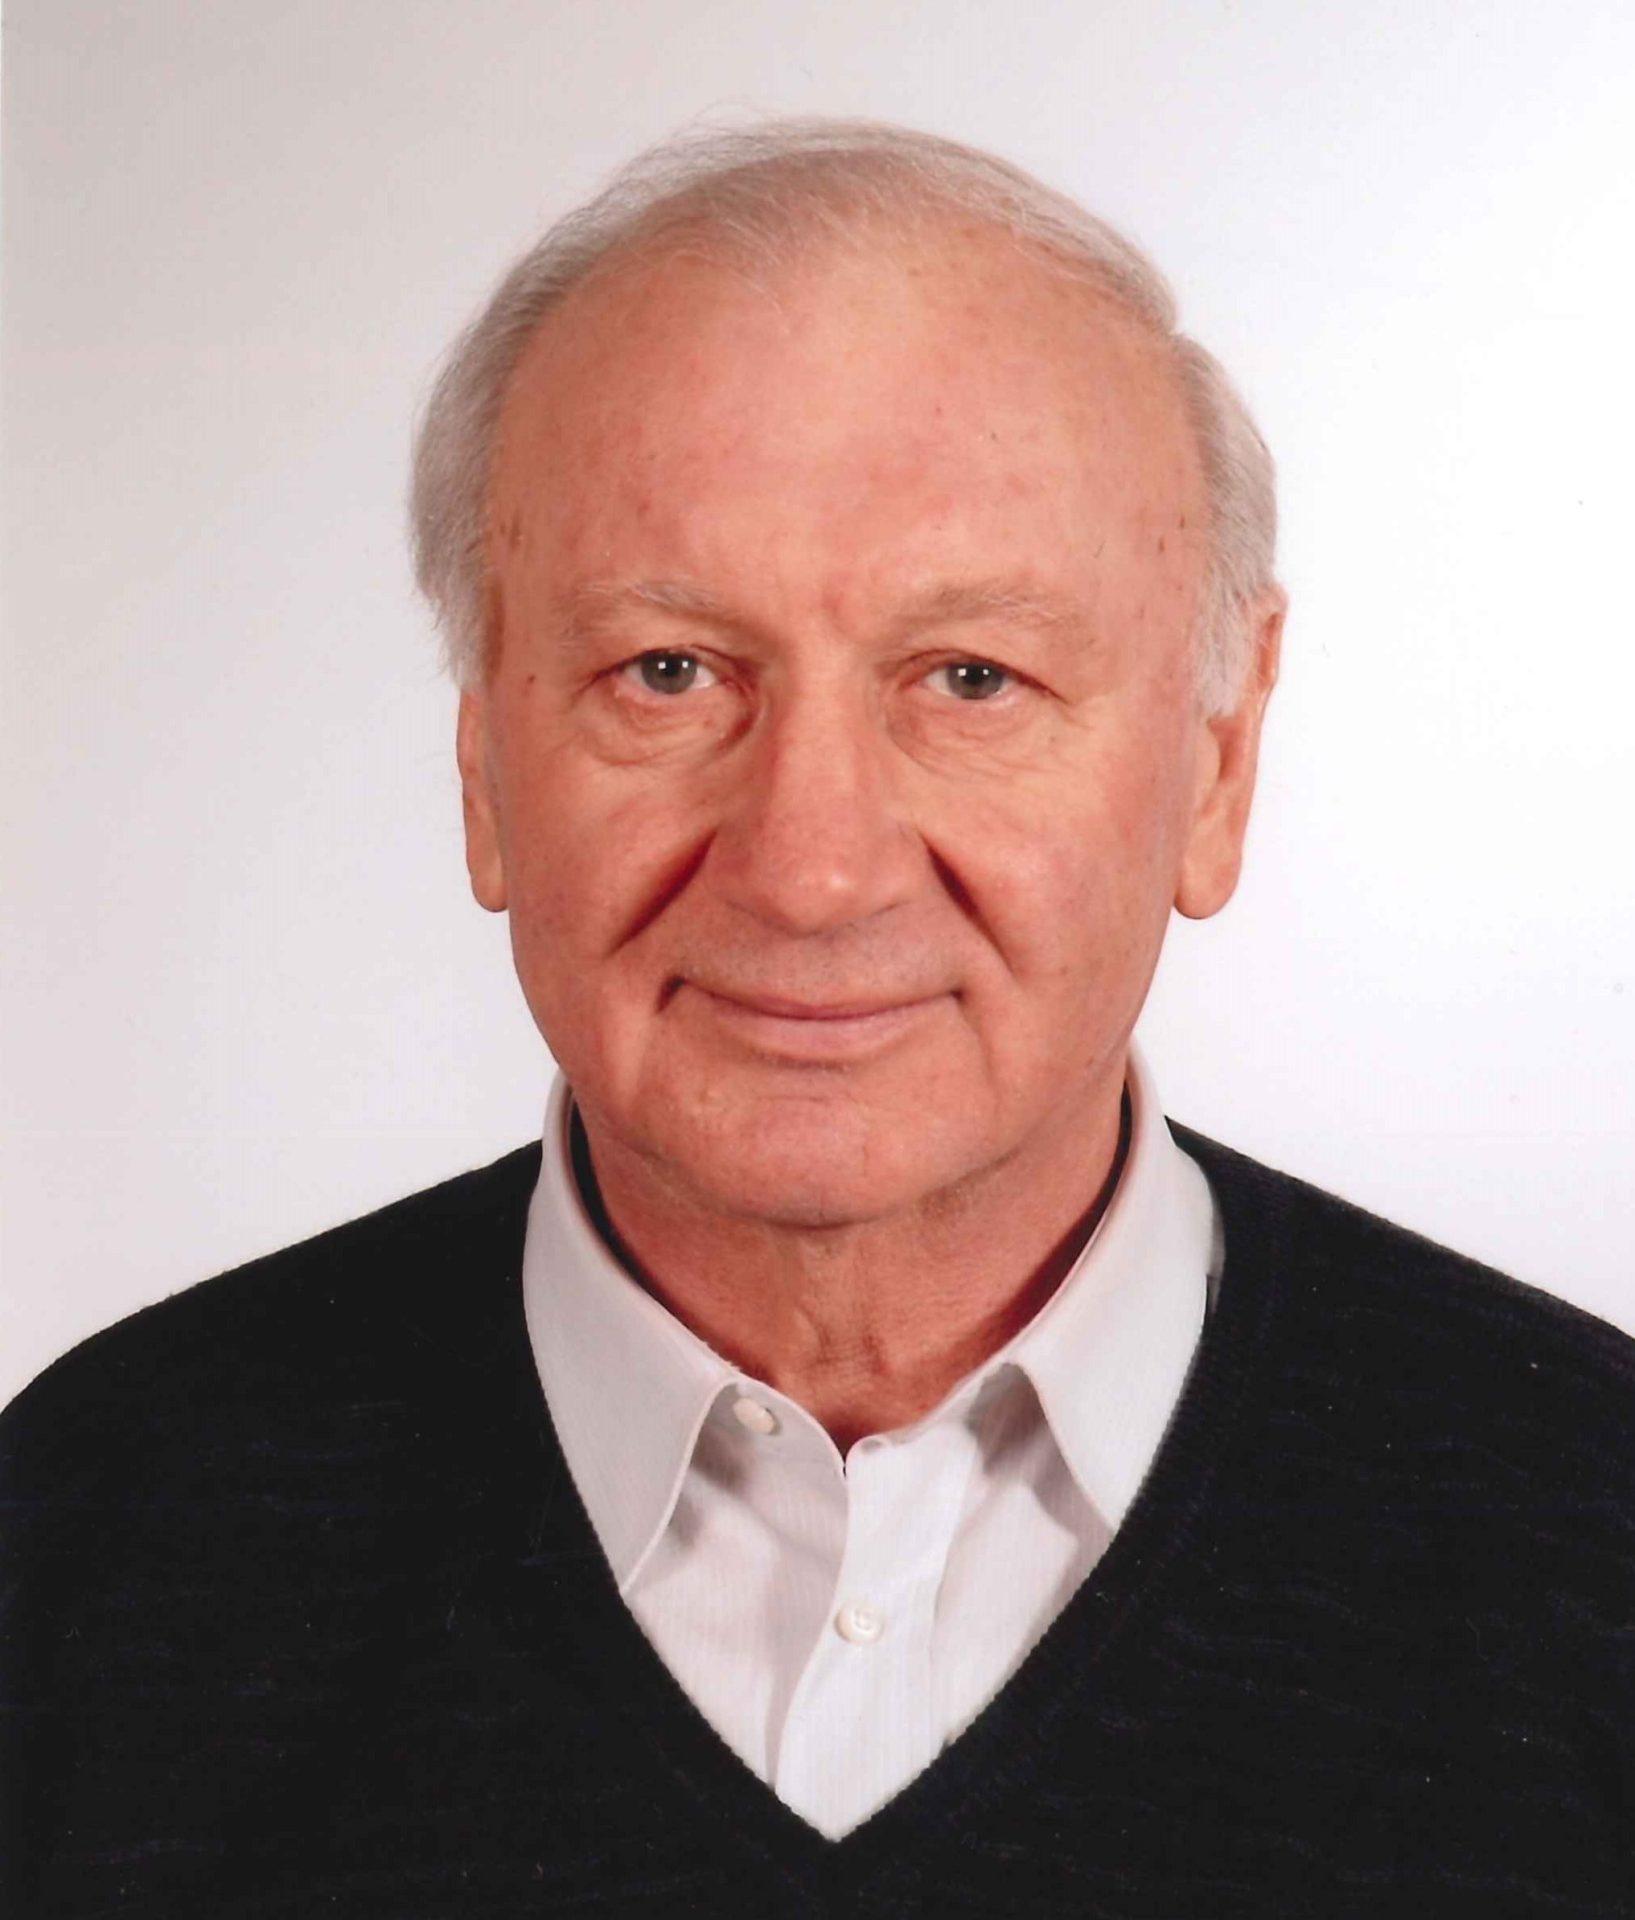 Walter Piovesan